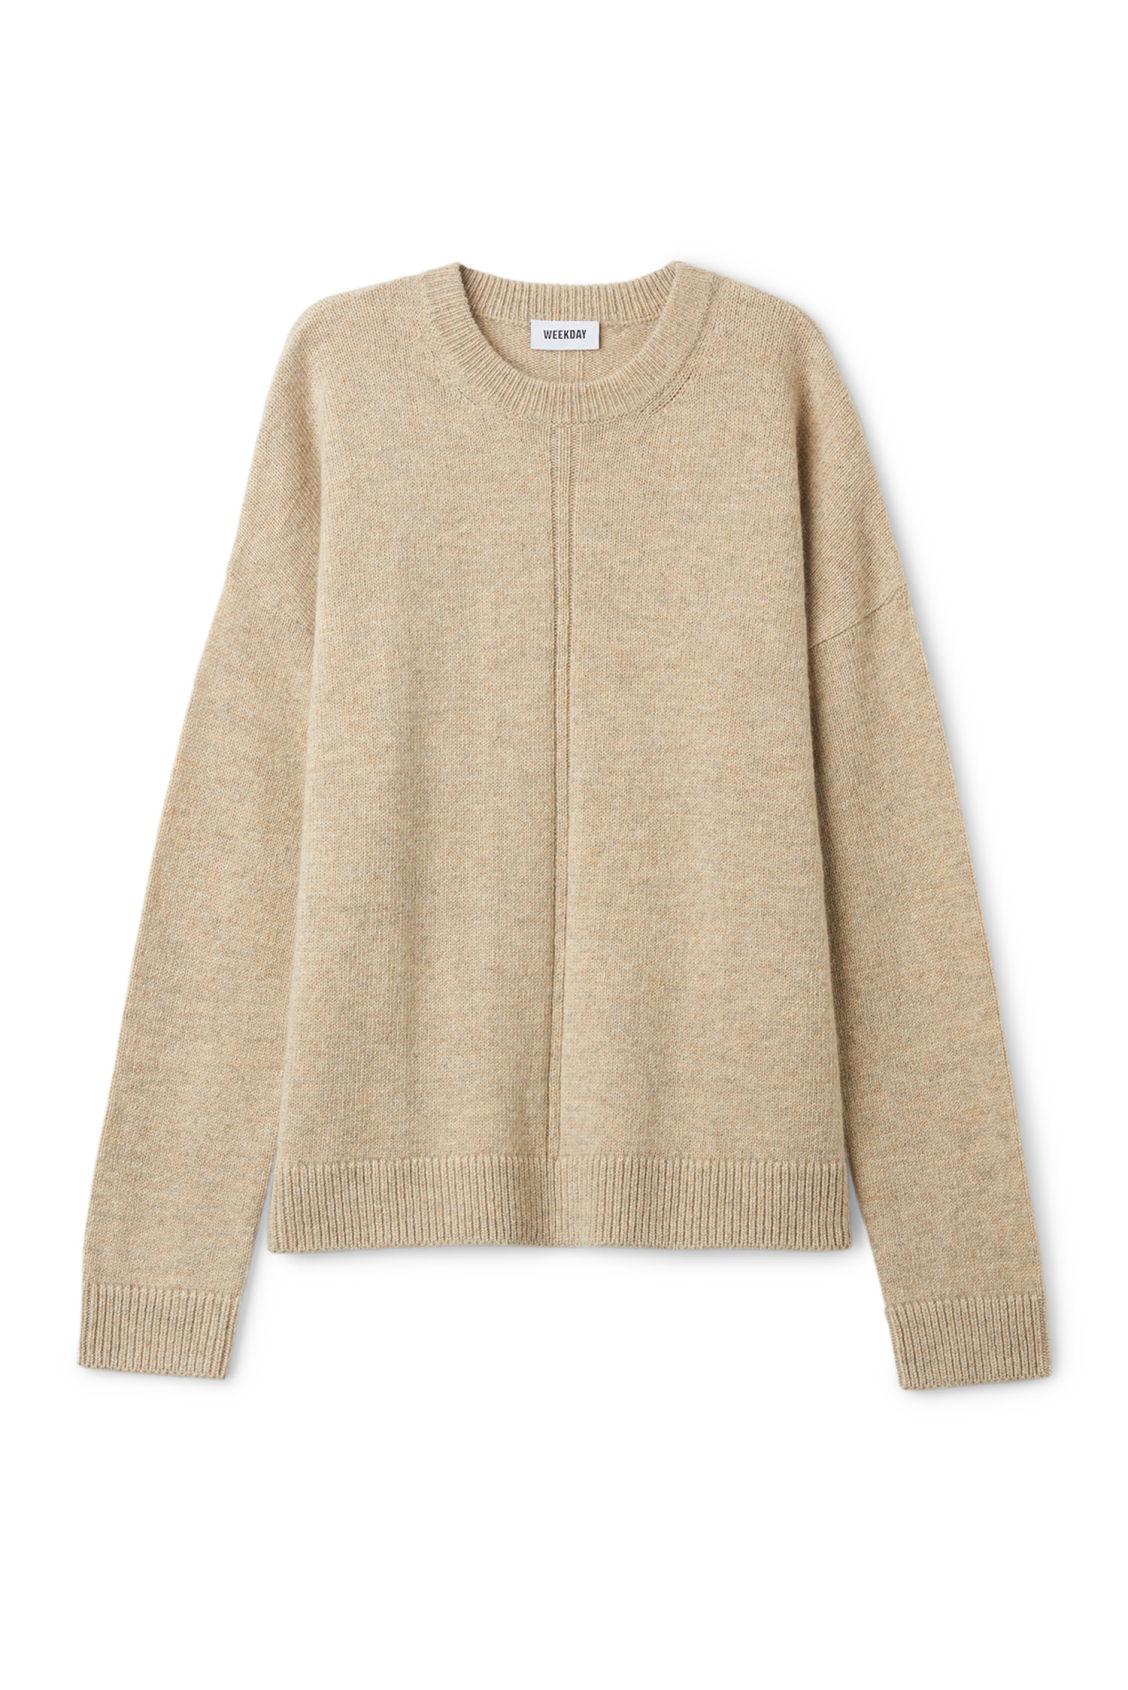 Sand Dark Knitwear Sweater Weekday Font qASEg